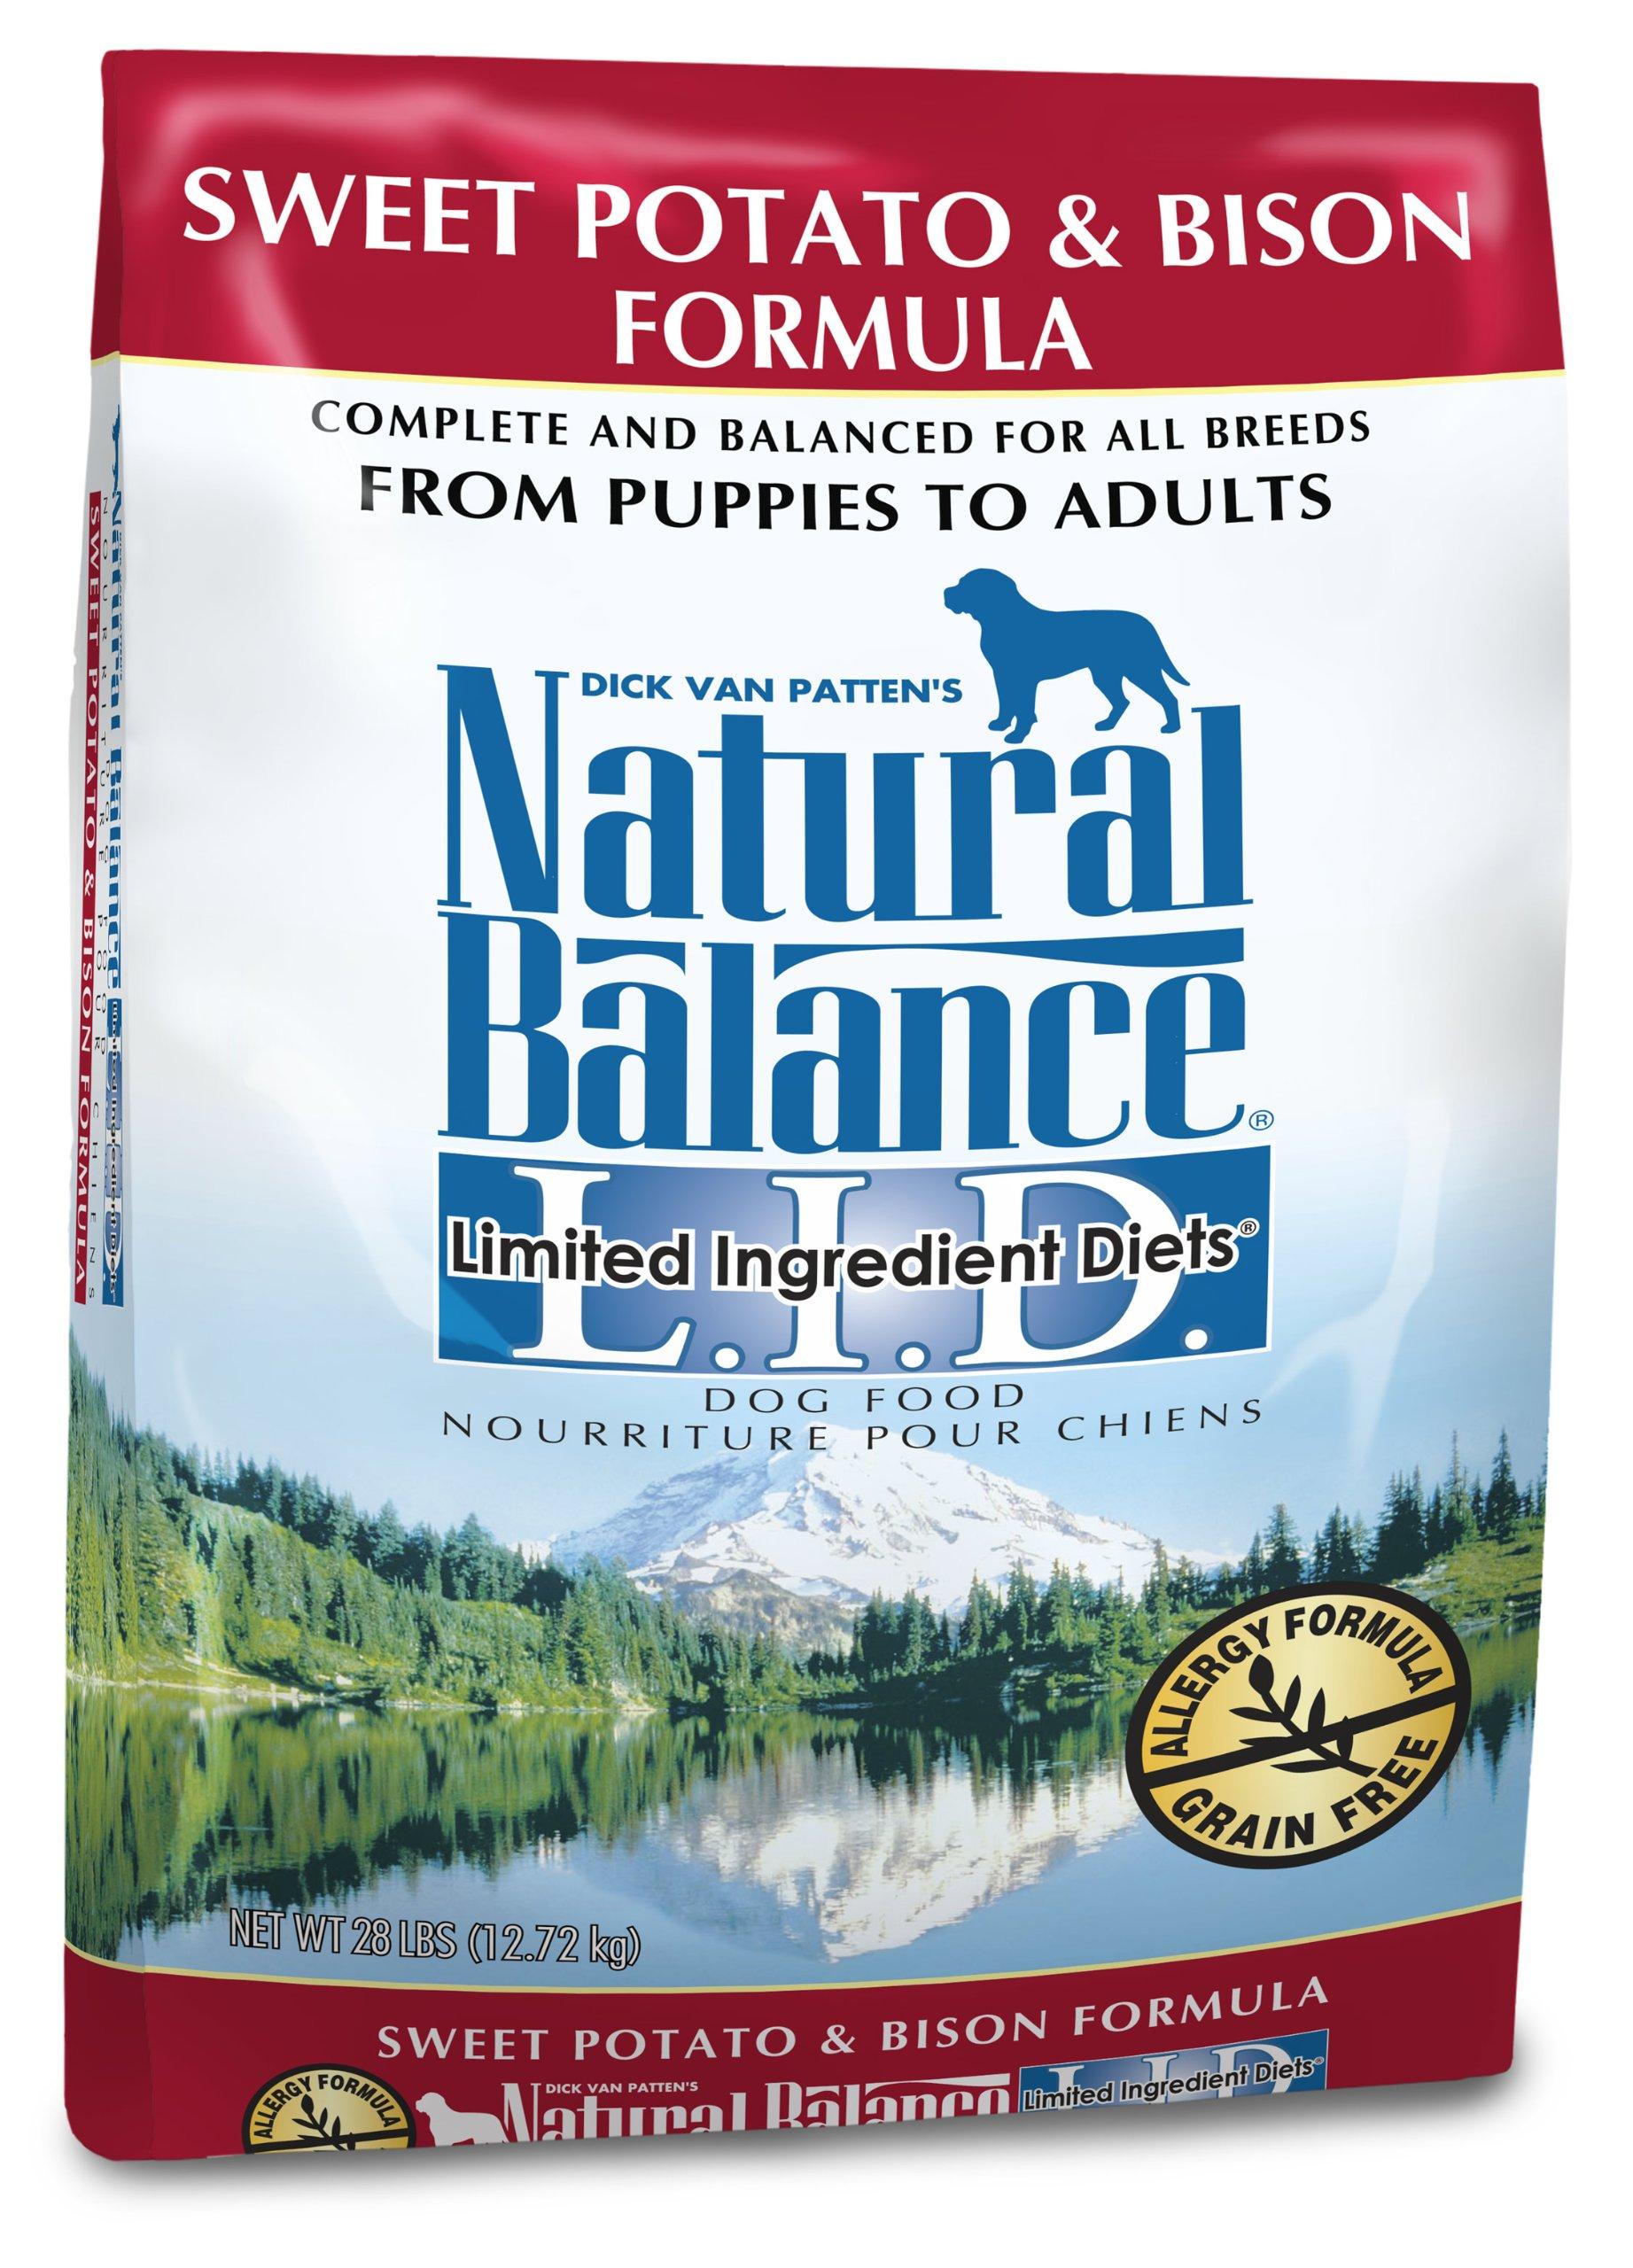 Natural Balance Dry Dog Food, Grain Free Limited Ingredient Diet Bison and Sweet Potato Recipe, 28 Pound Bag